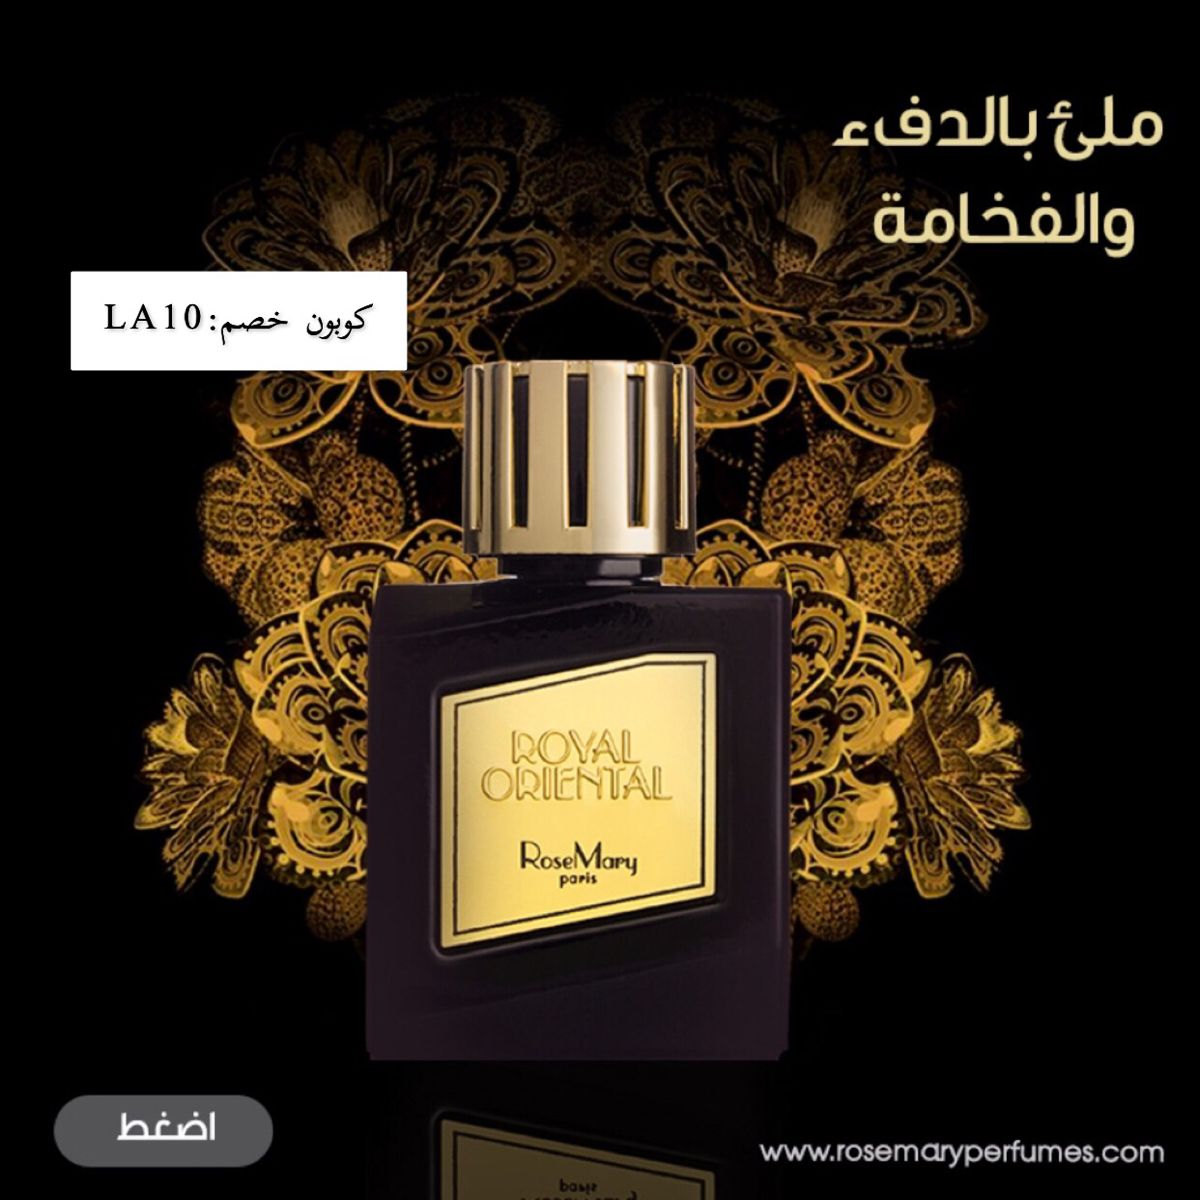 Pin By Ghadah Shop On كوبونات خصم اكواد In 2021 Perfume Bottles Perfume Paris